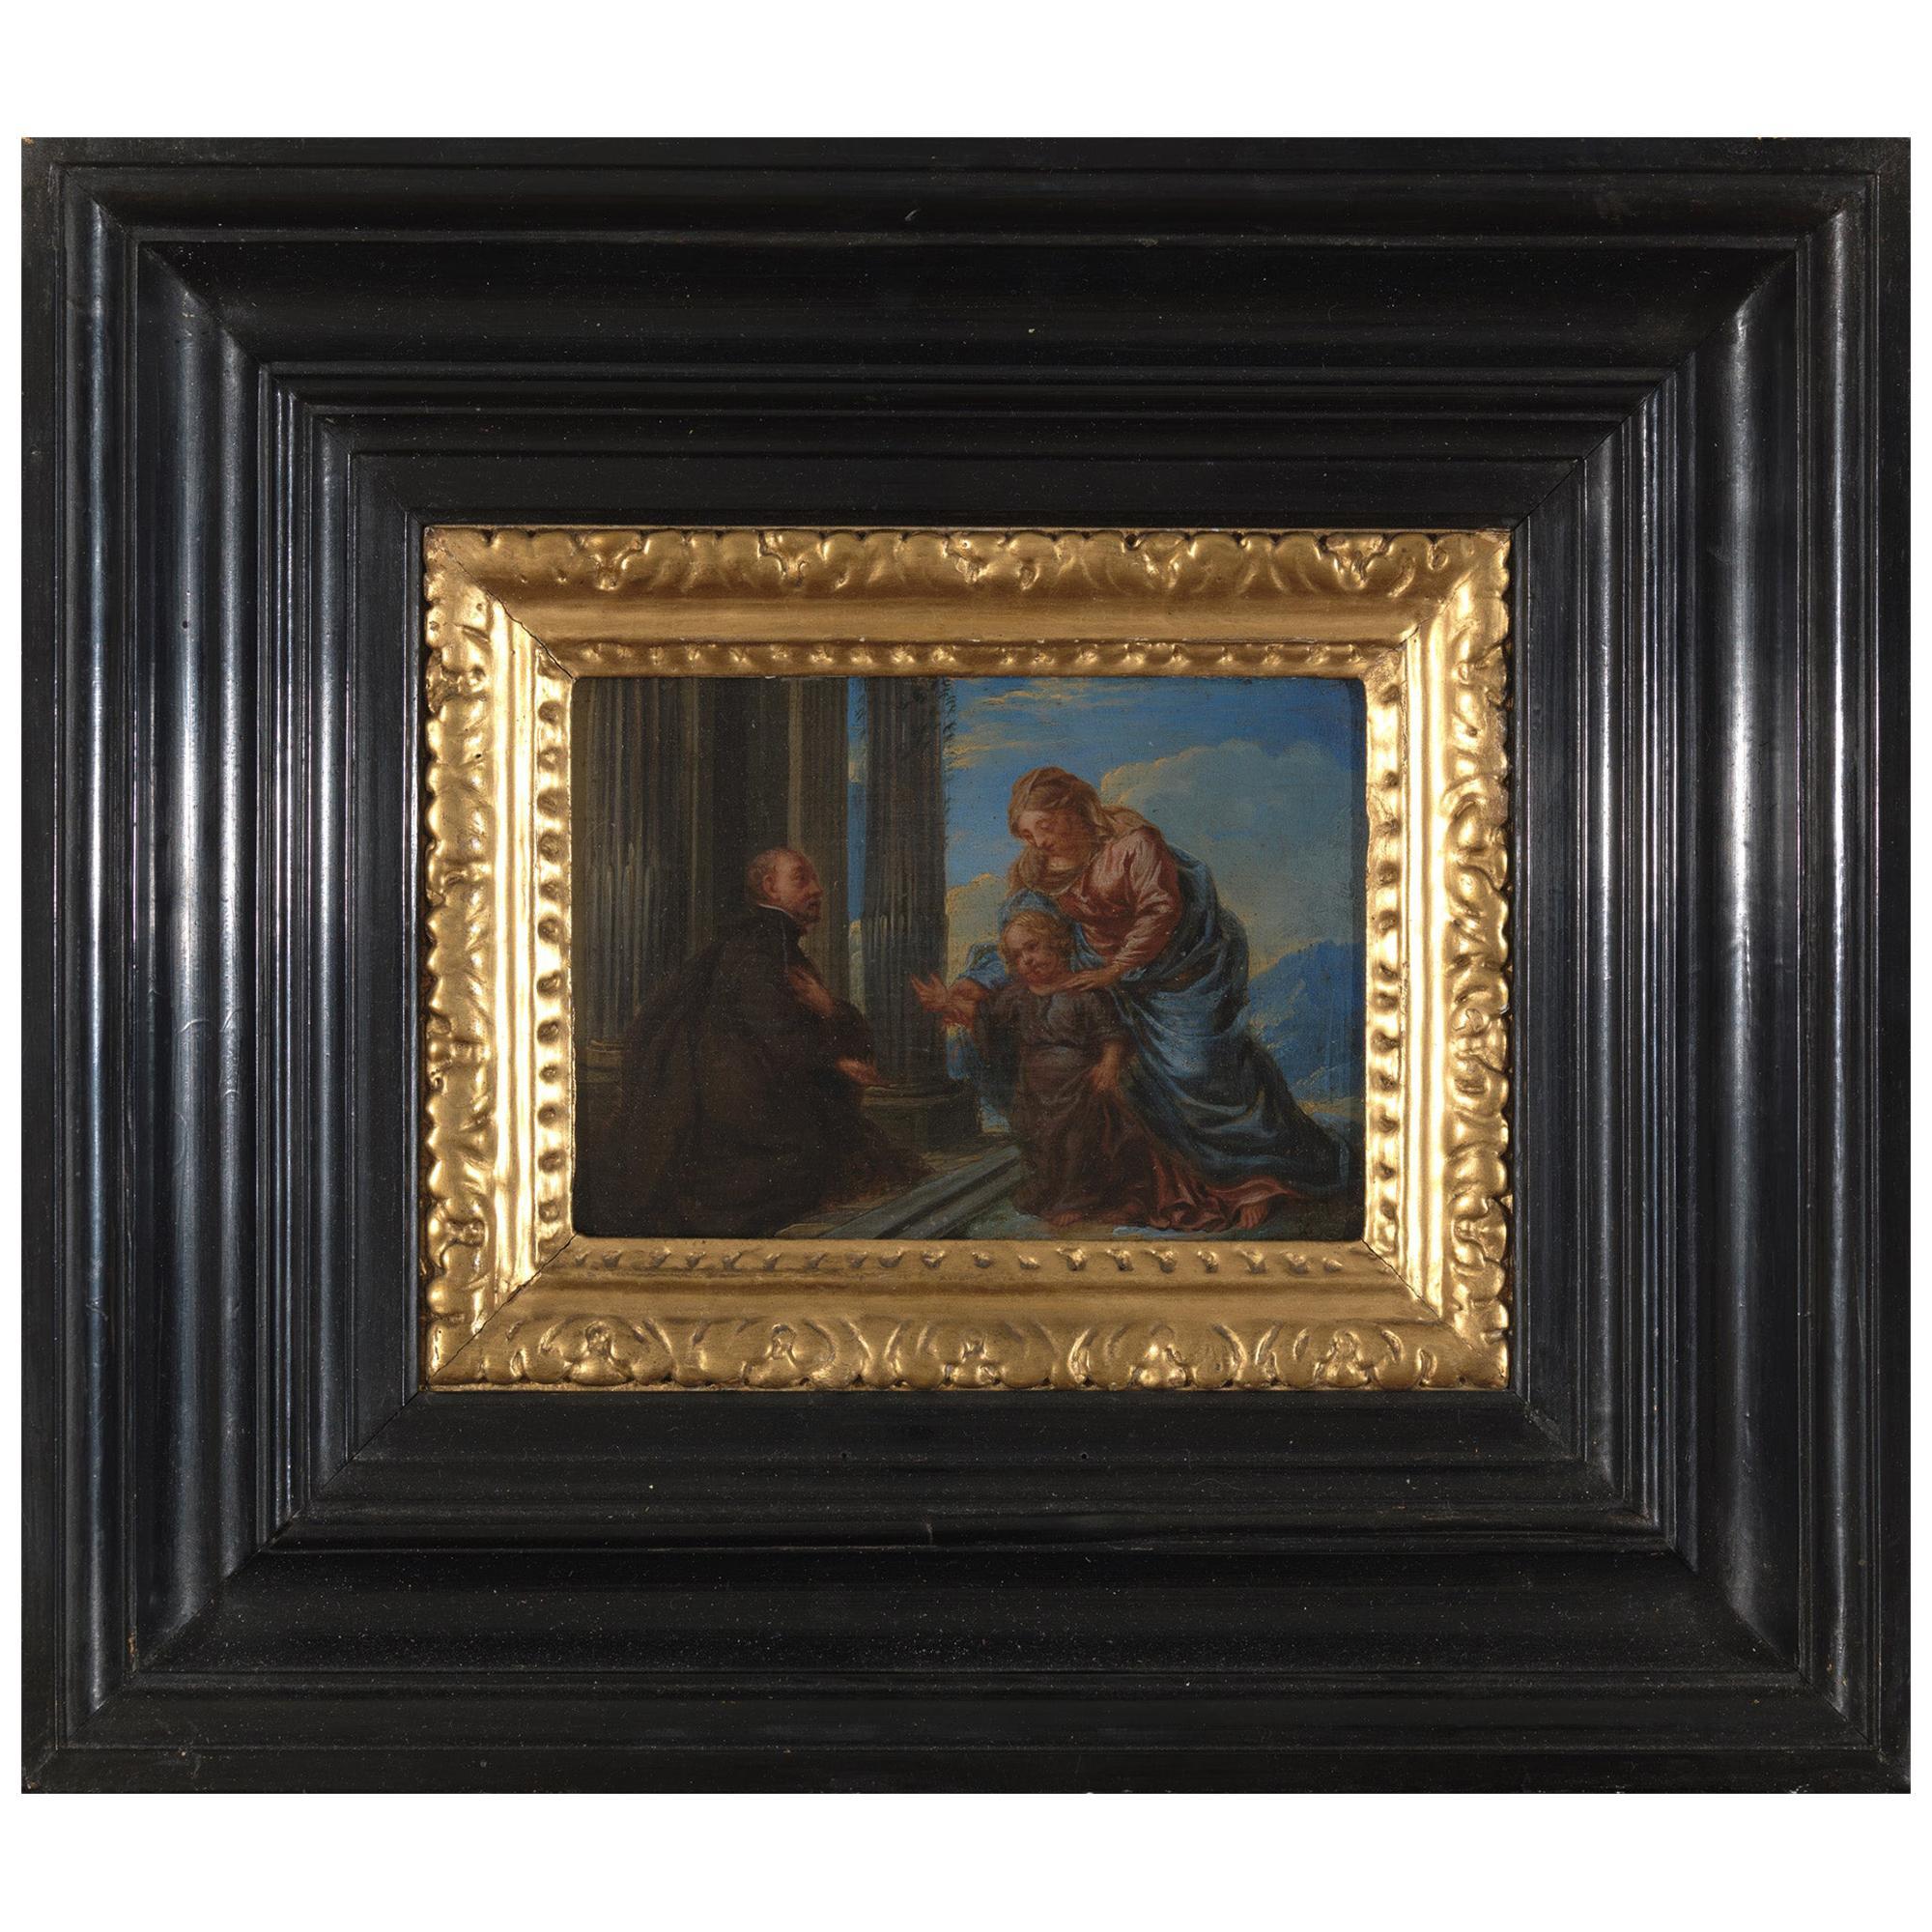 17th Century Flemish School 'monogram IG or LG', Maria and Christ, Oil on Panel